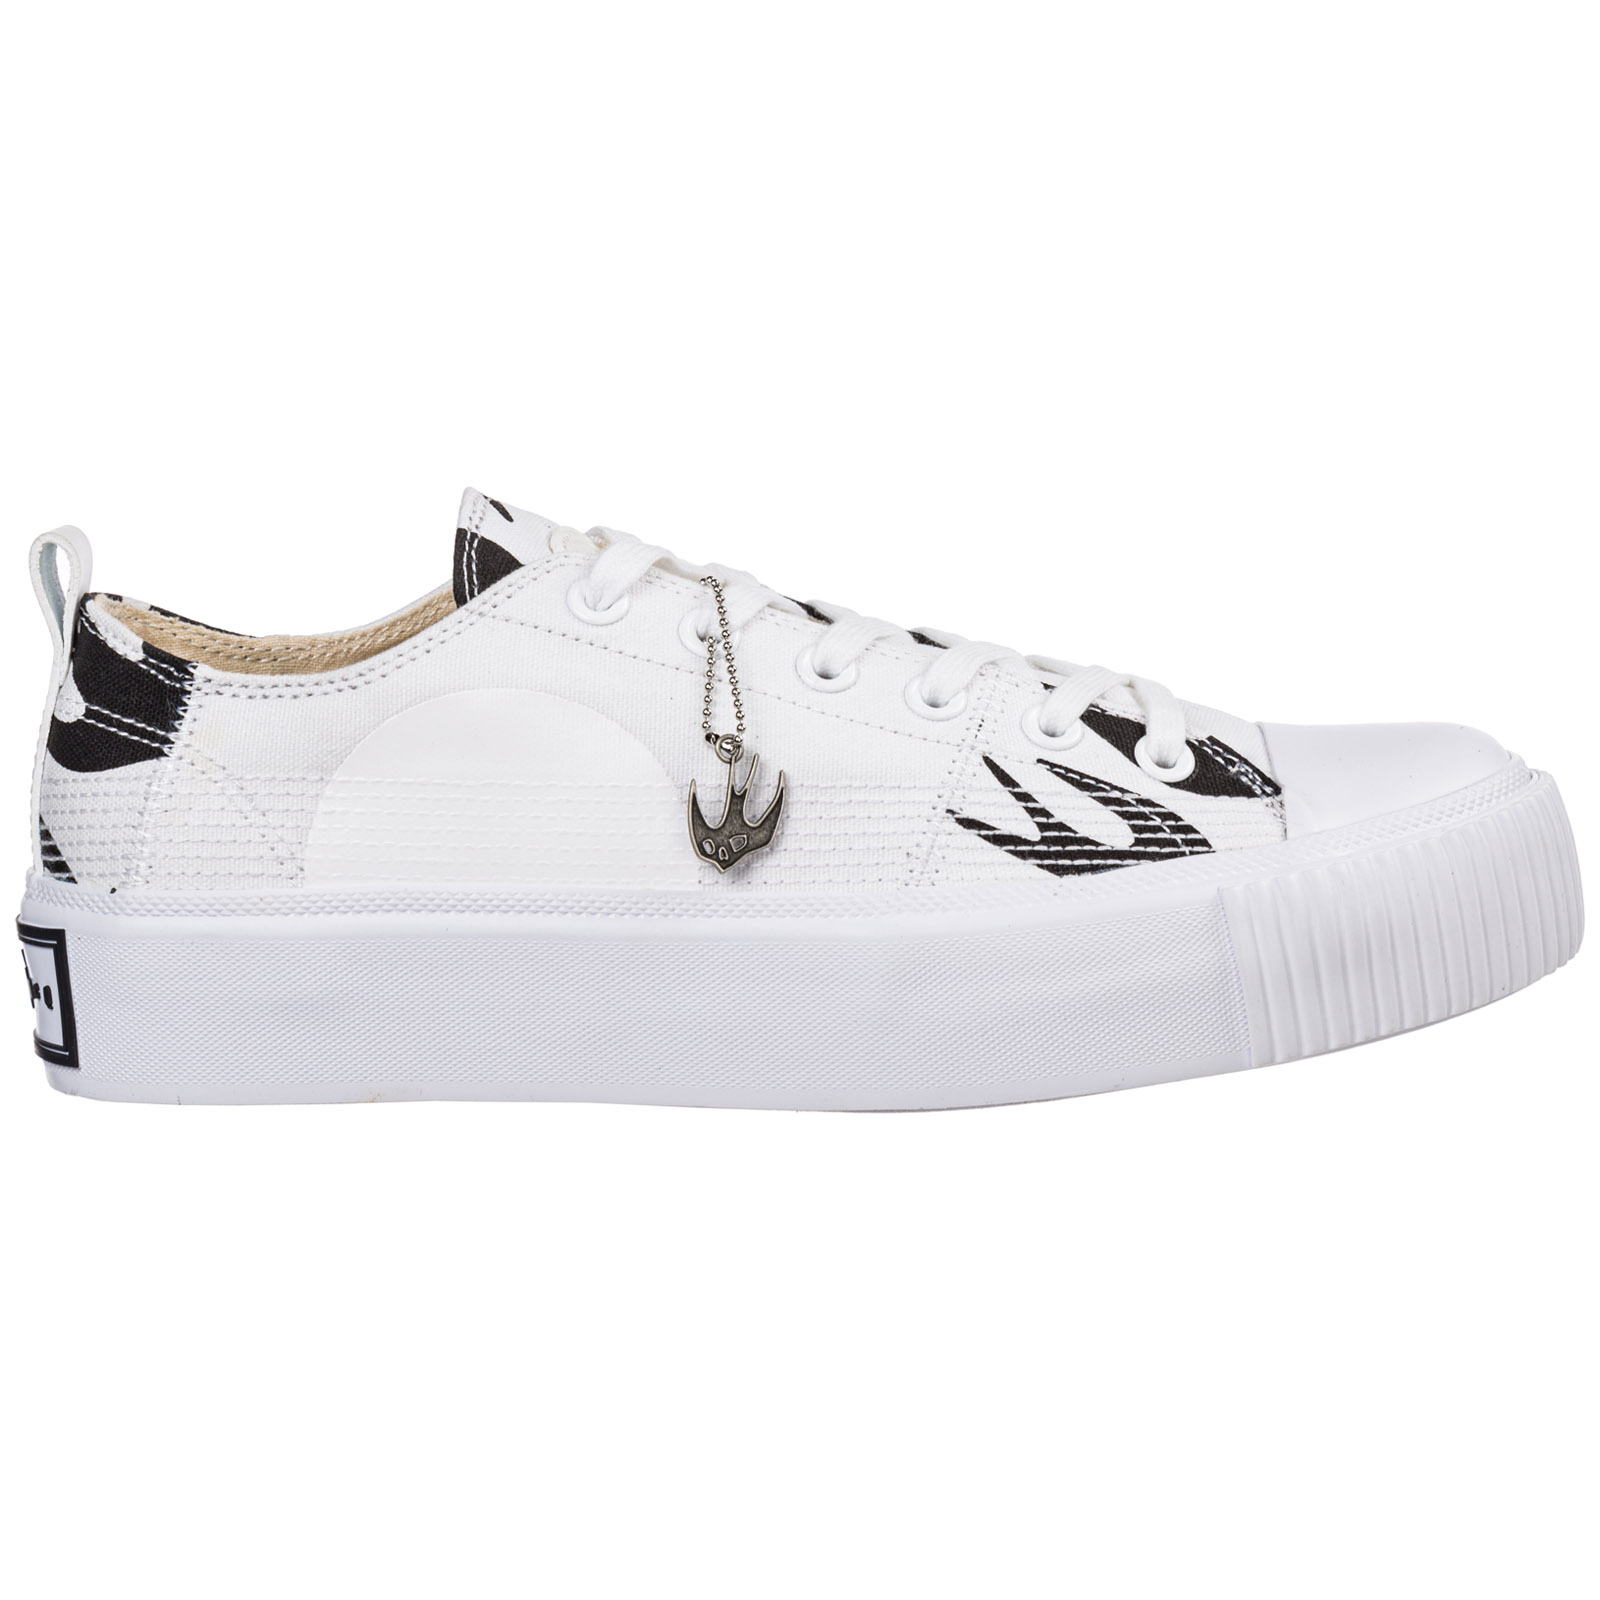 Mcq By Alexander Mcqueen Men's Shoes